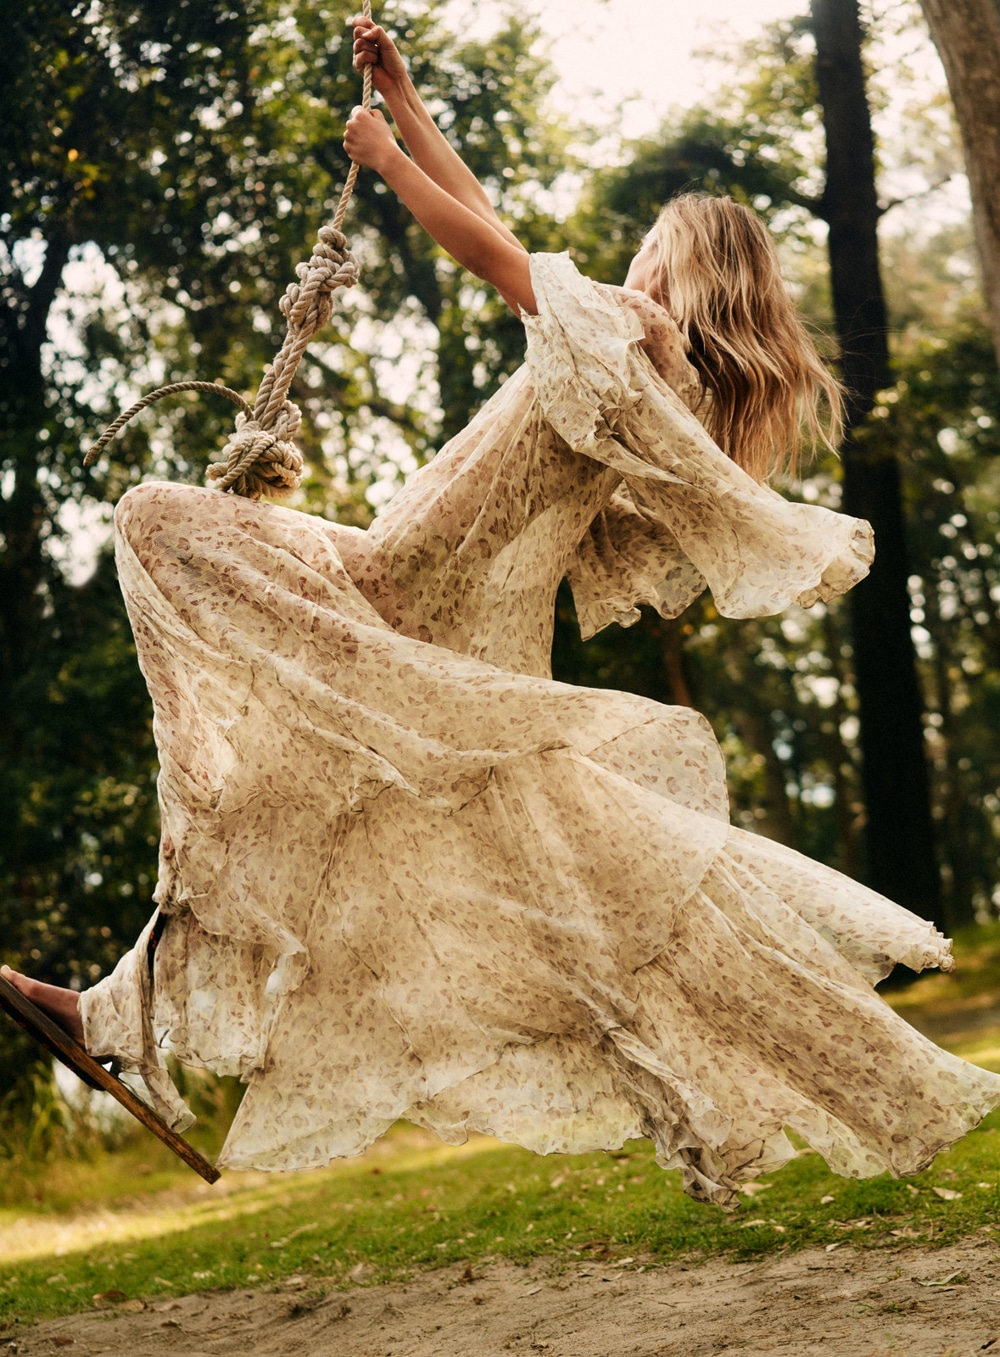 Esti van Balen by Georges Antoni for Elle Australia Nov 2018 (2).jpg